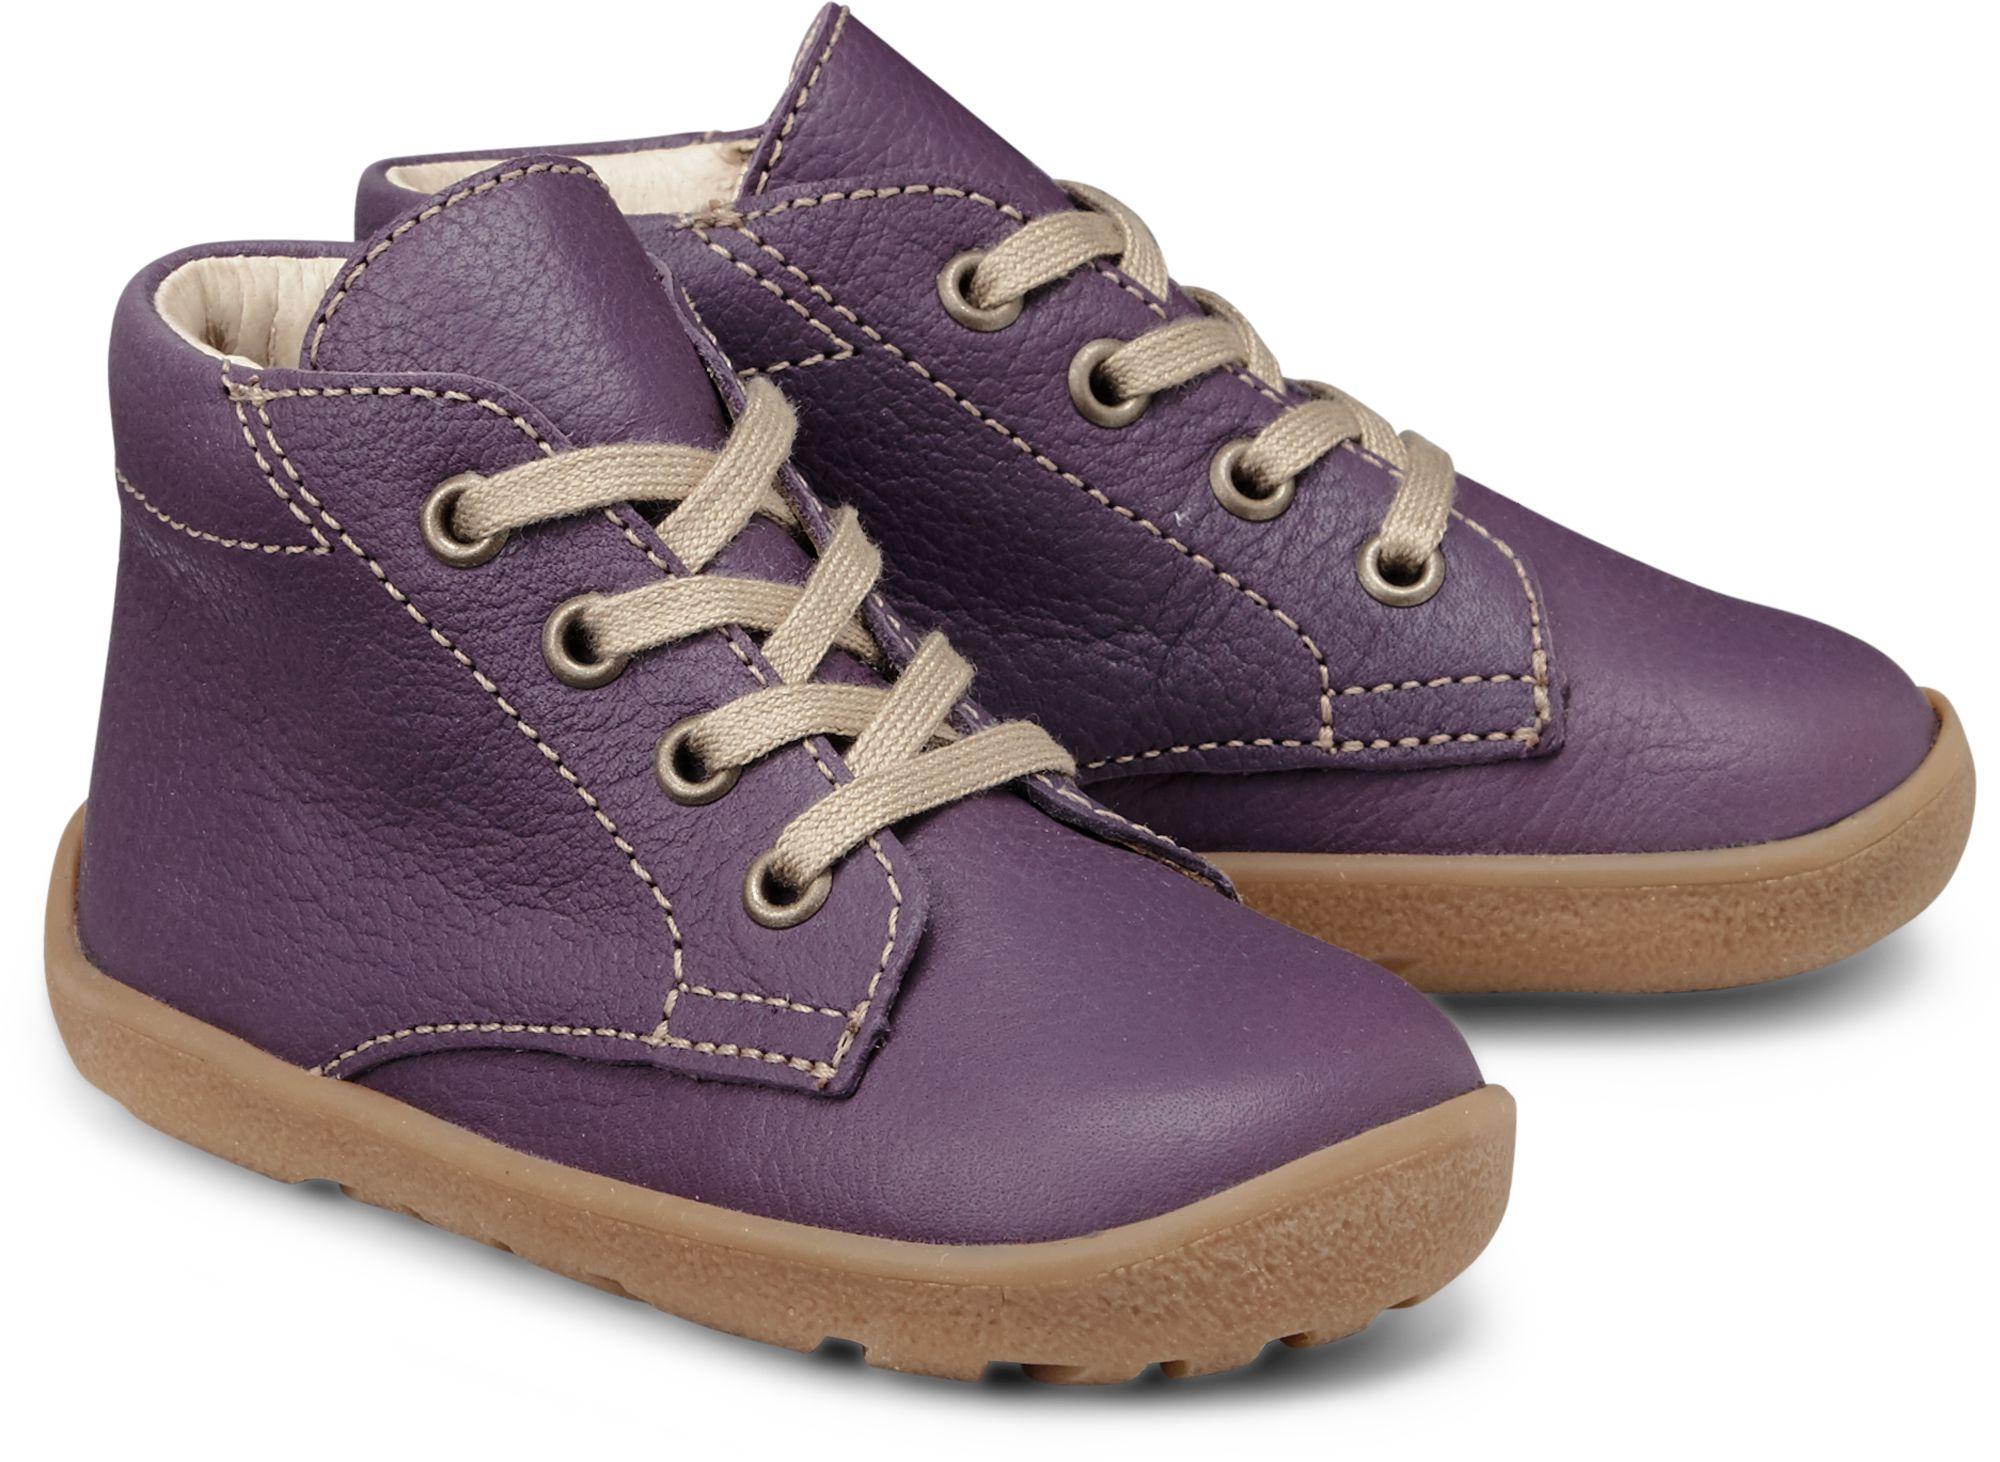 Svea Billie Blush, Schuhe, Sneaker & Sportschuhe, Sneaker, Lila, Female, 36